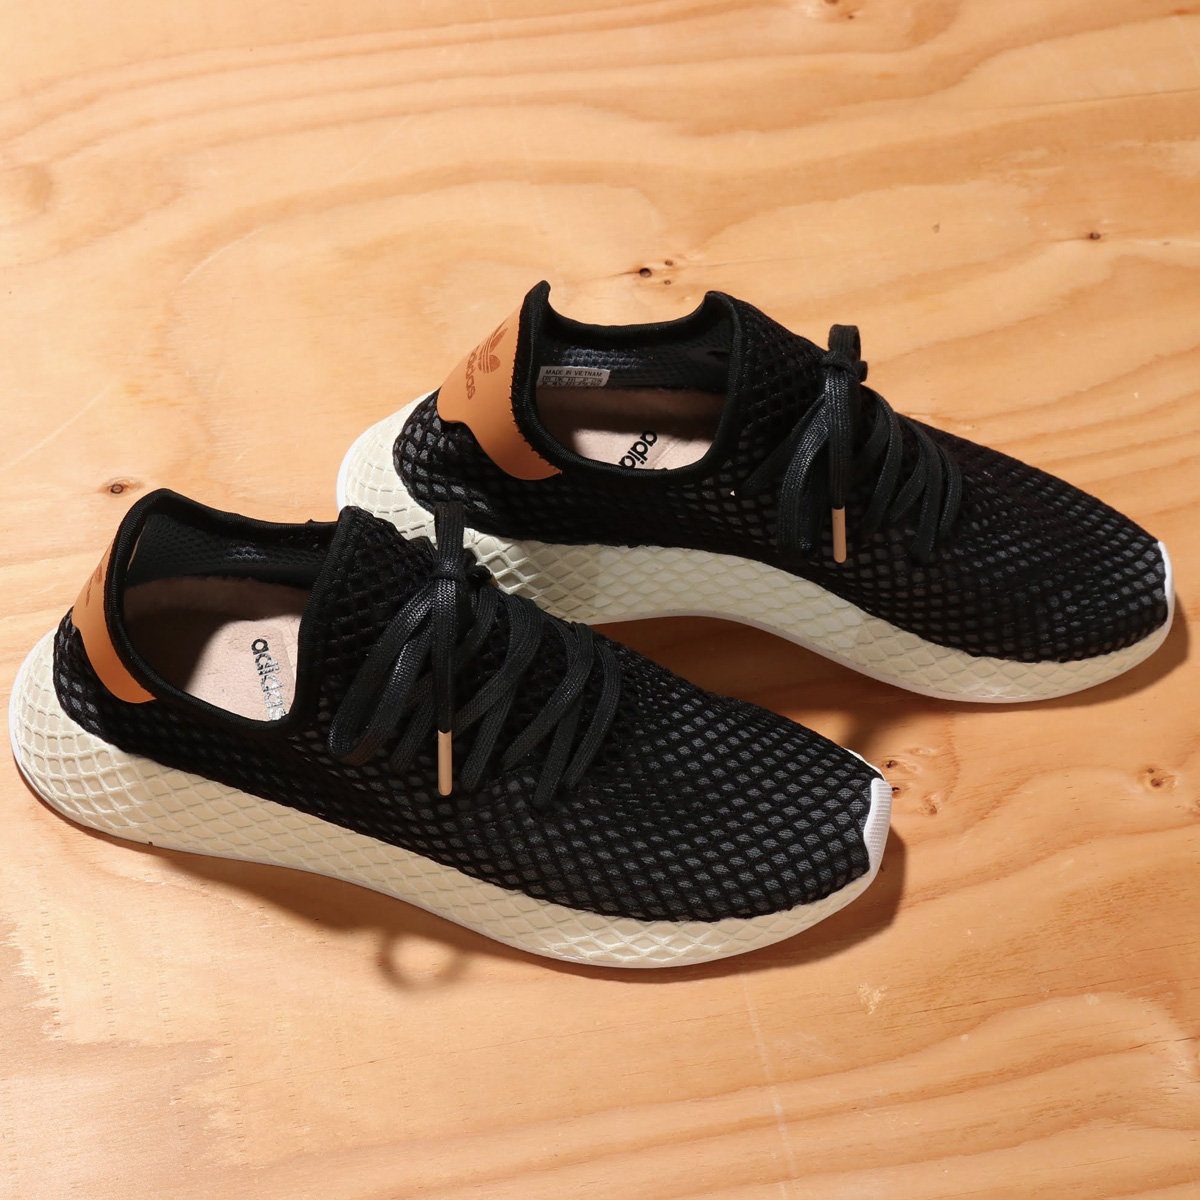 adidas Originals DEERUPT RUNNER(アディダス オリジナルス ディラプトランナー)CORE BLACK/CORE BLACK/ASH PEARL【メンズ スニーカー】18FW-I